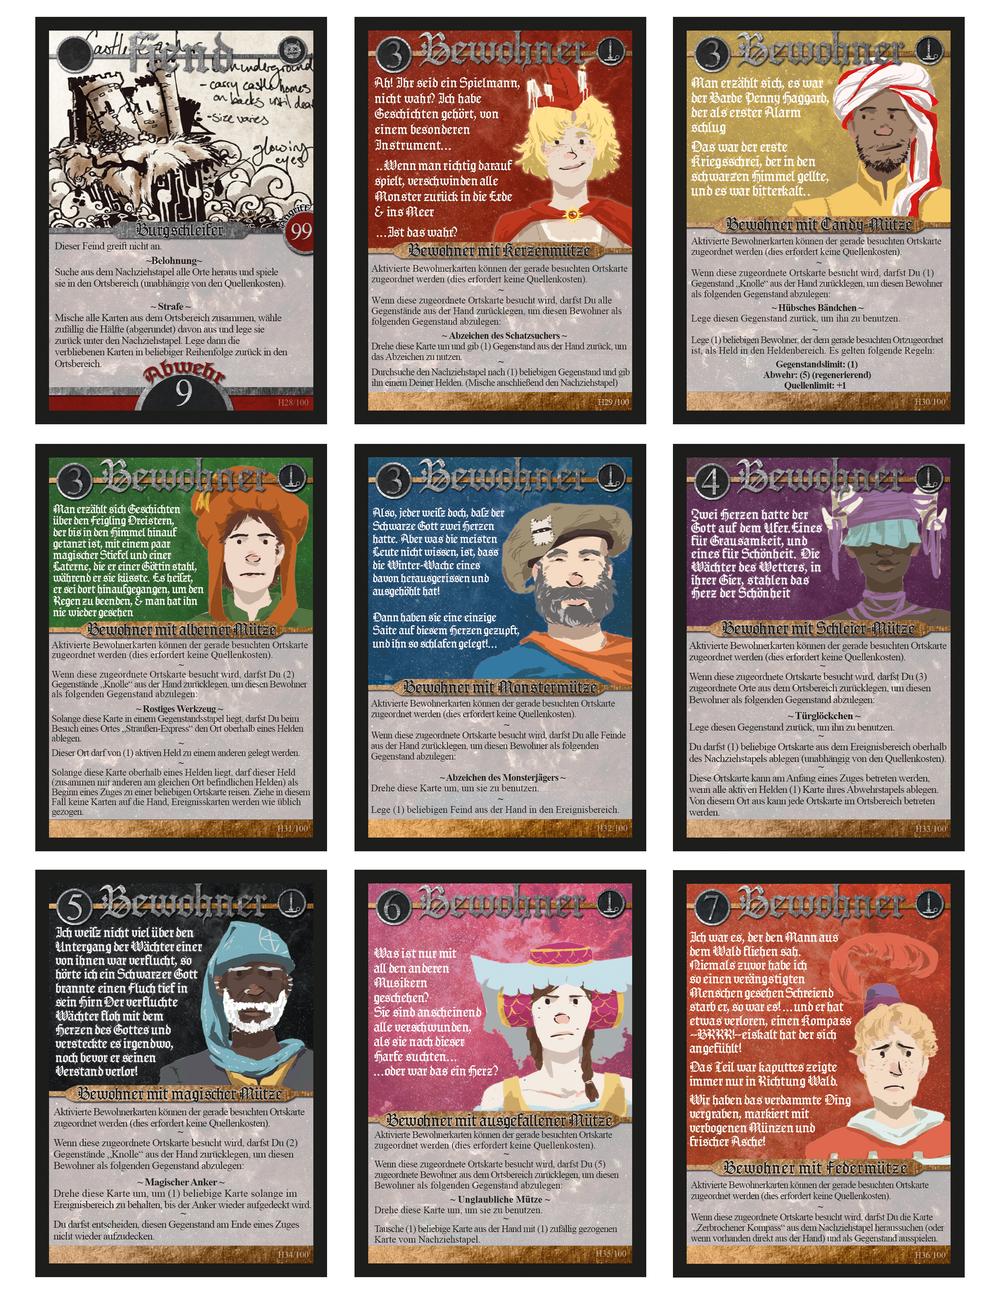 2014/2015 German edition Folk cards by Todd, Lauren, & Raimund Ruppel